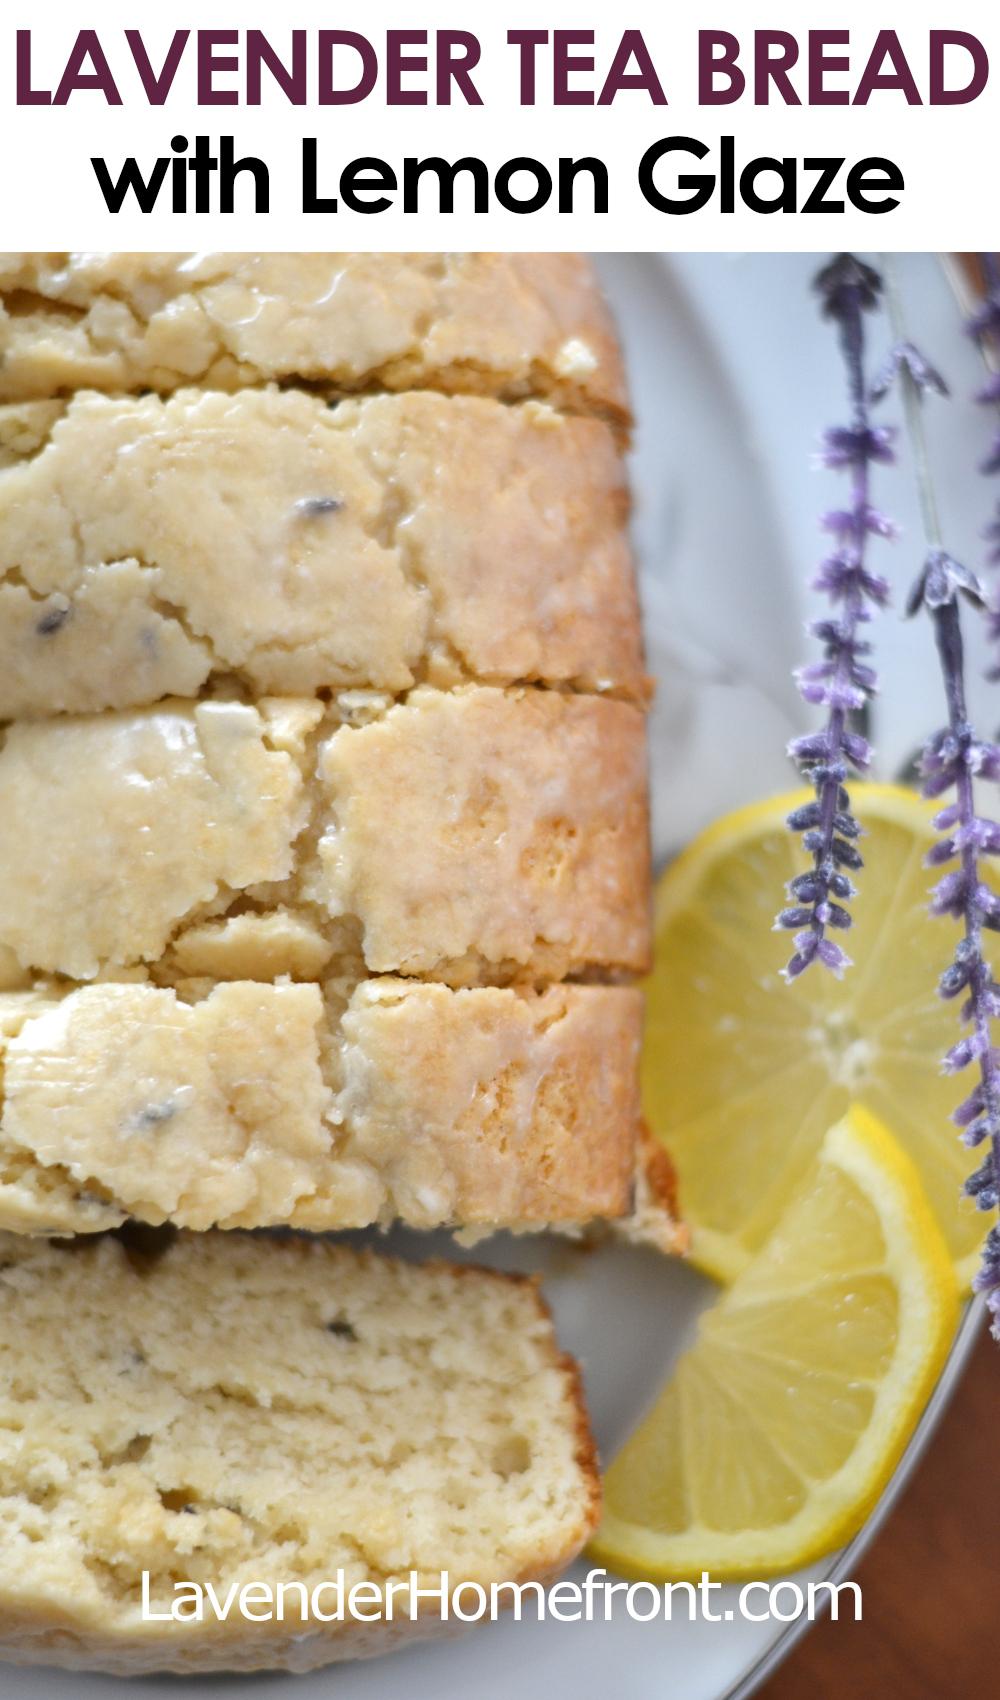 Lavender tea bread with lemon glaze pinnable image with text overlay